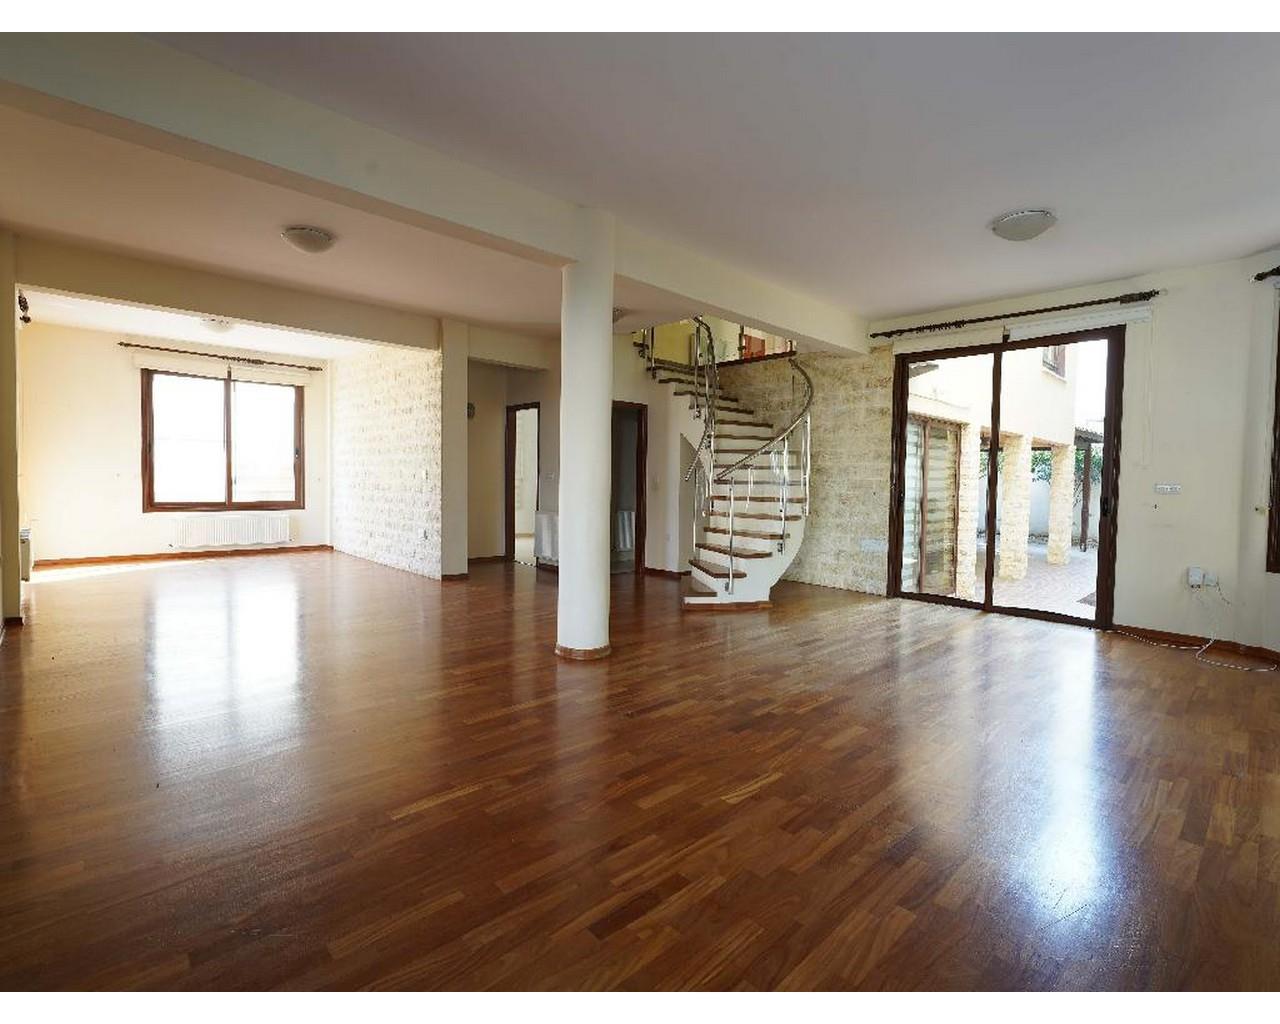 House Nicosia(Lakatamia)  4 Bedrooms 4 Bathrooms 320 SqMt fo.....